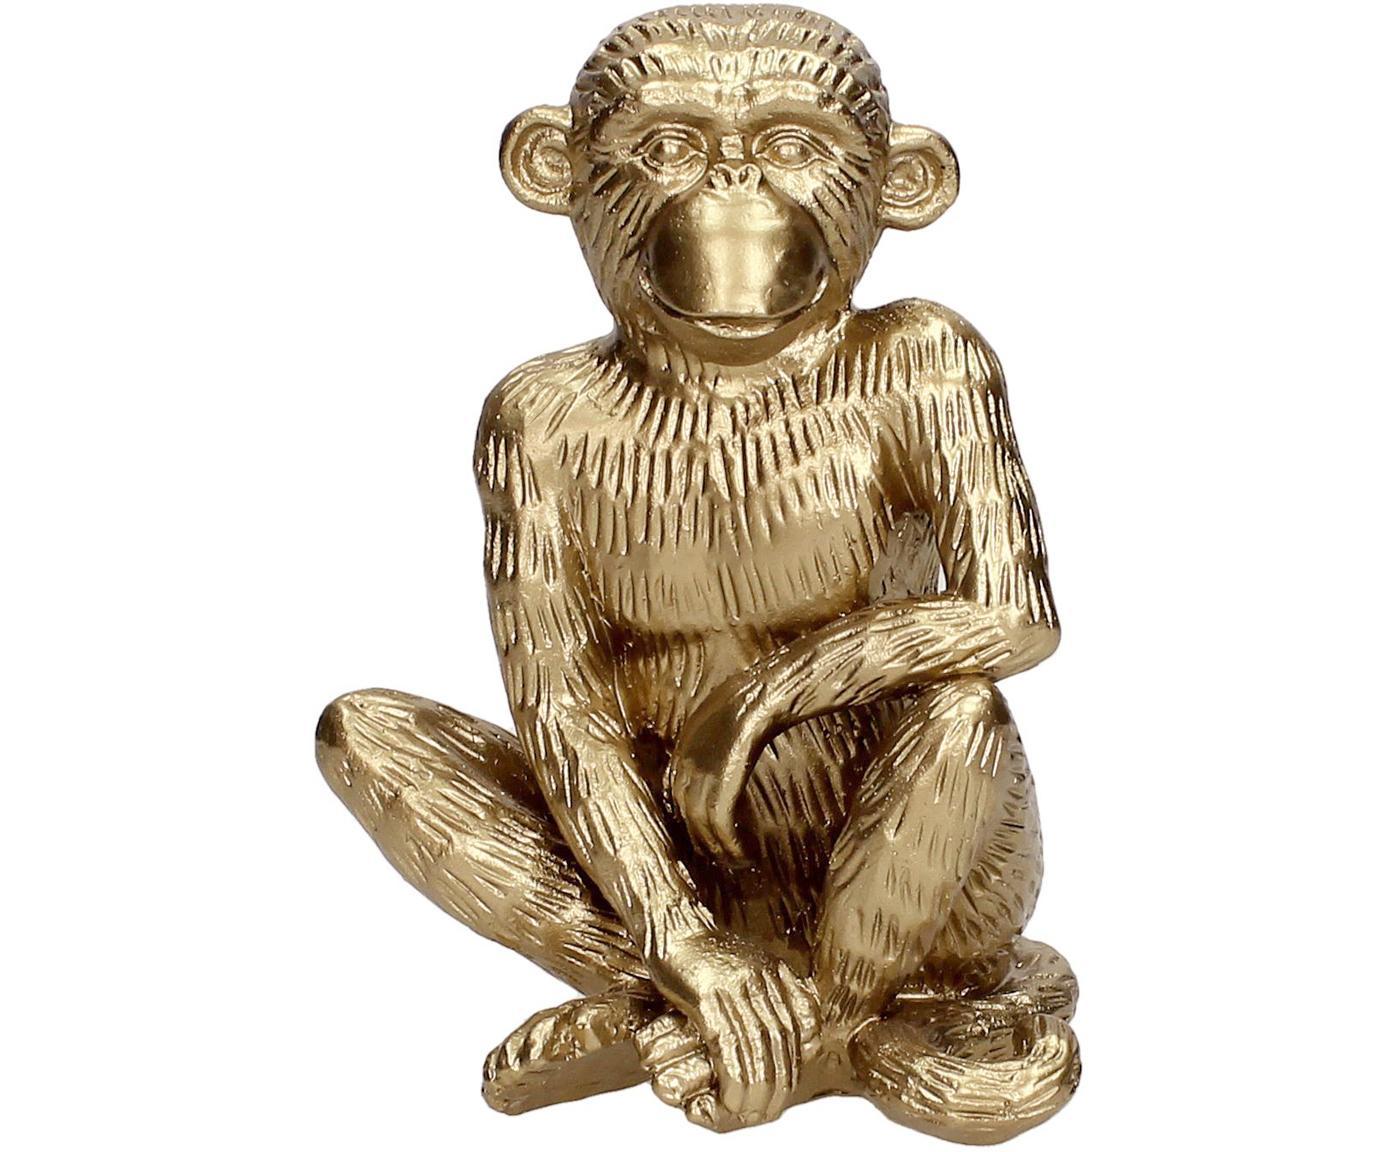 Decoratief object Monkey, Polyresin, Goudkleurig, 12 x 15 cm